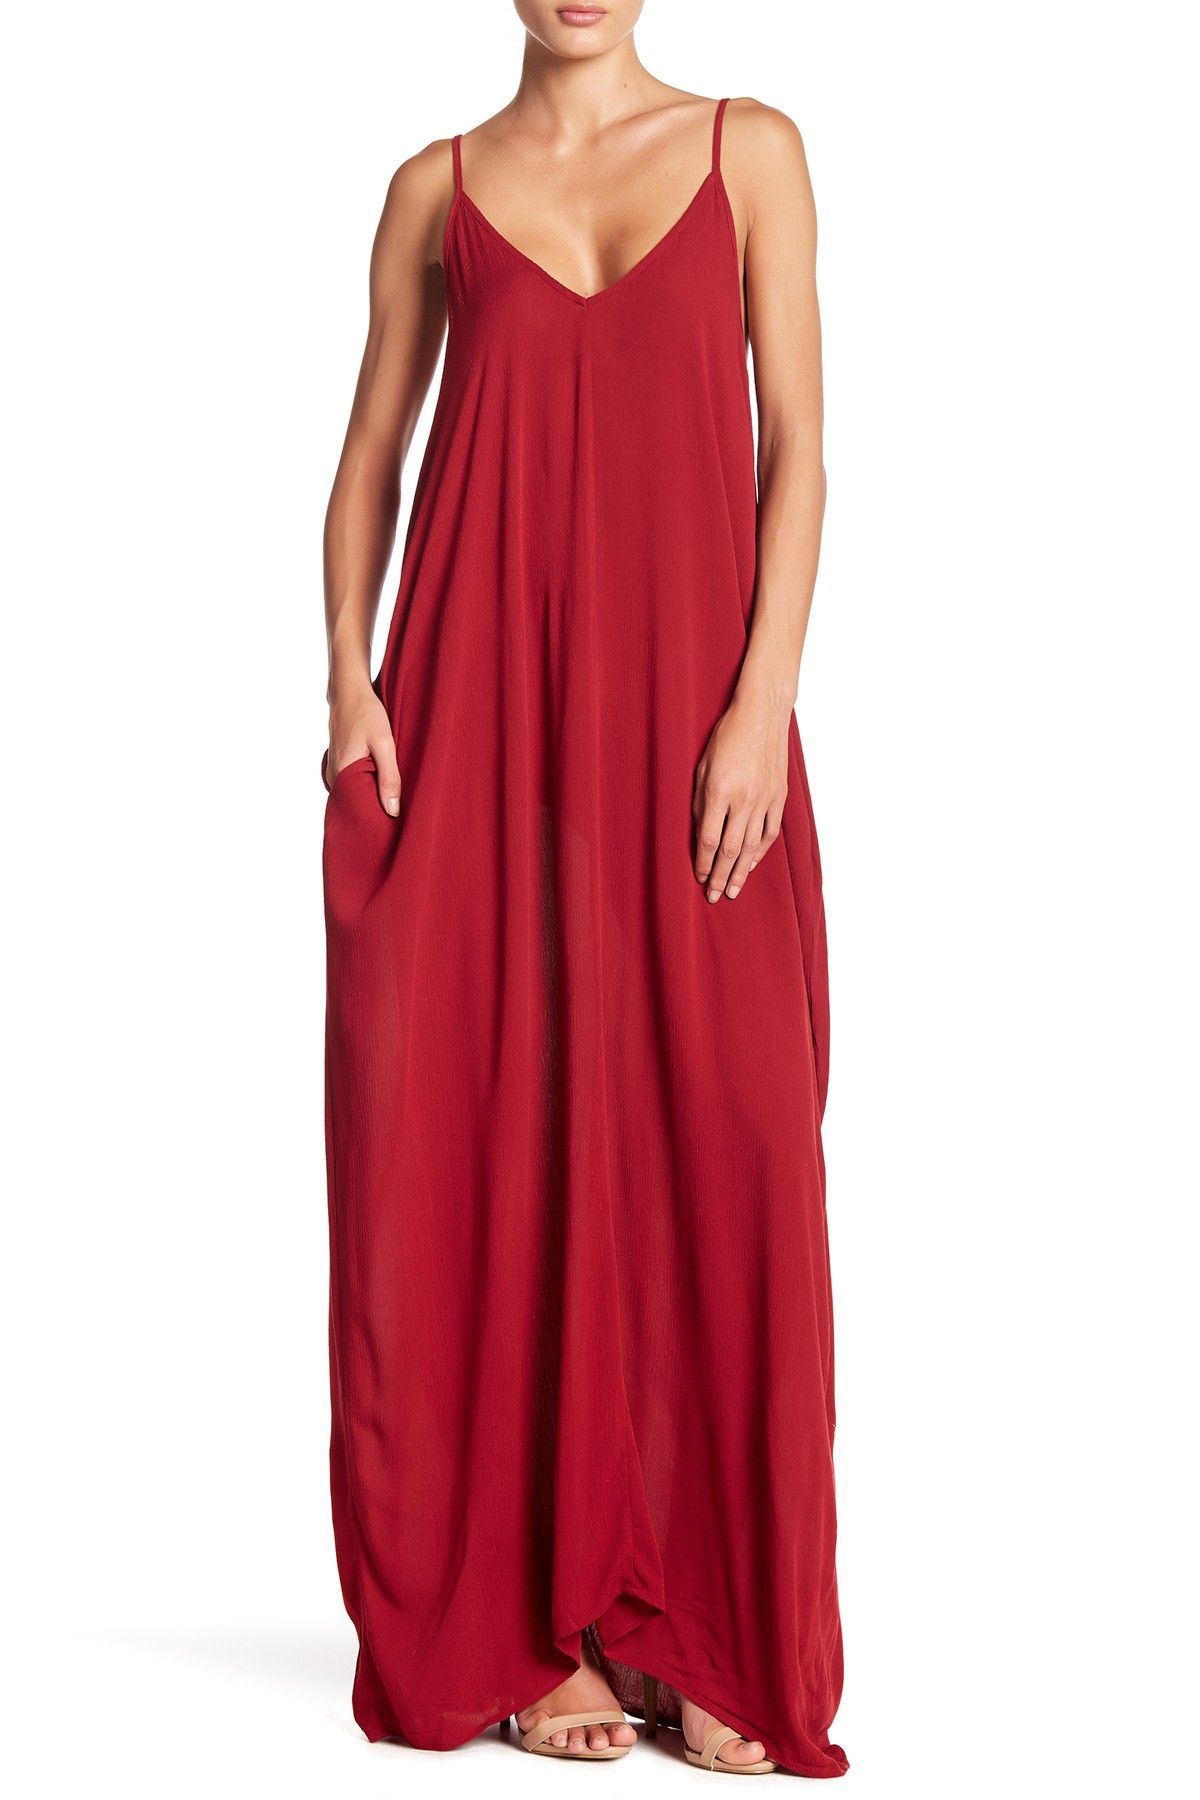 8856bcd6491 V-Neck Sleeveless Gauze Maxi Dress in 2019 | Fashion | Nordstrom ...